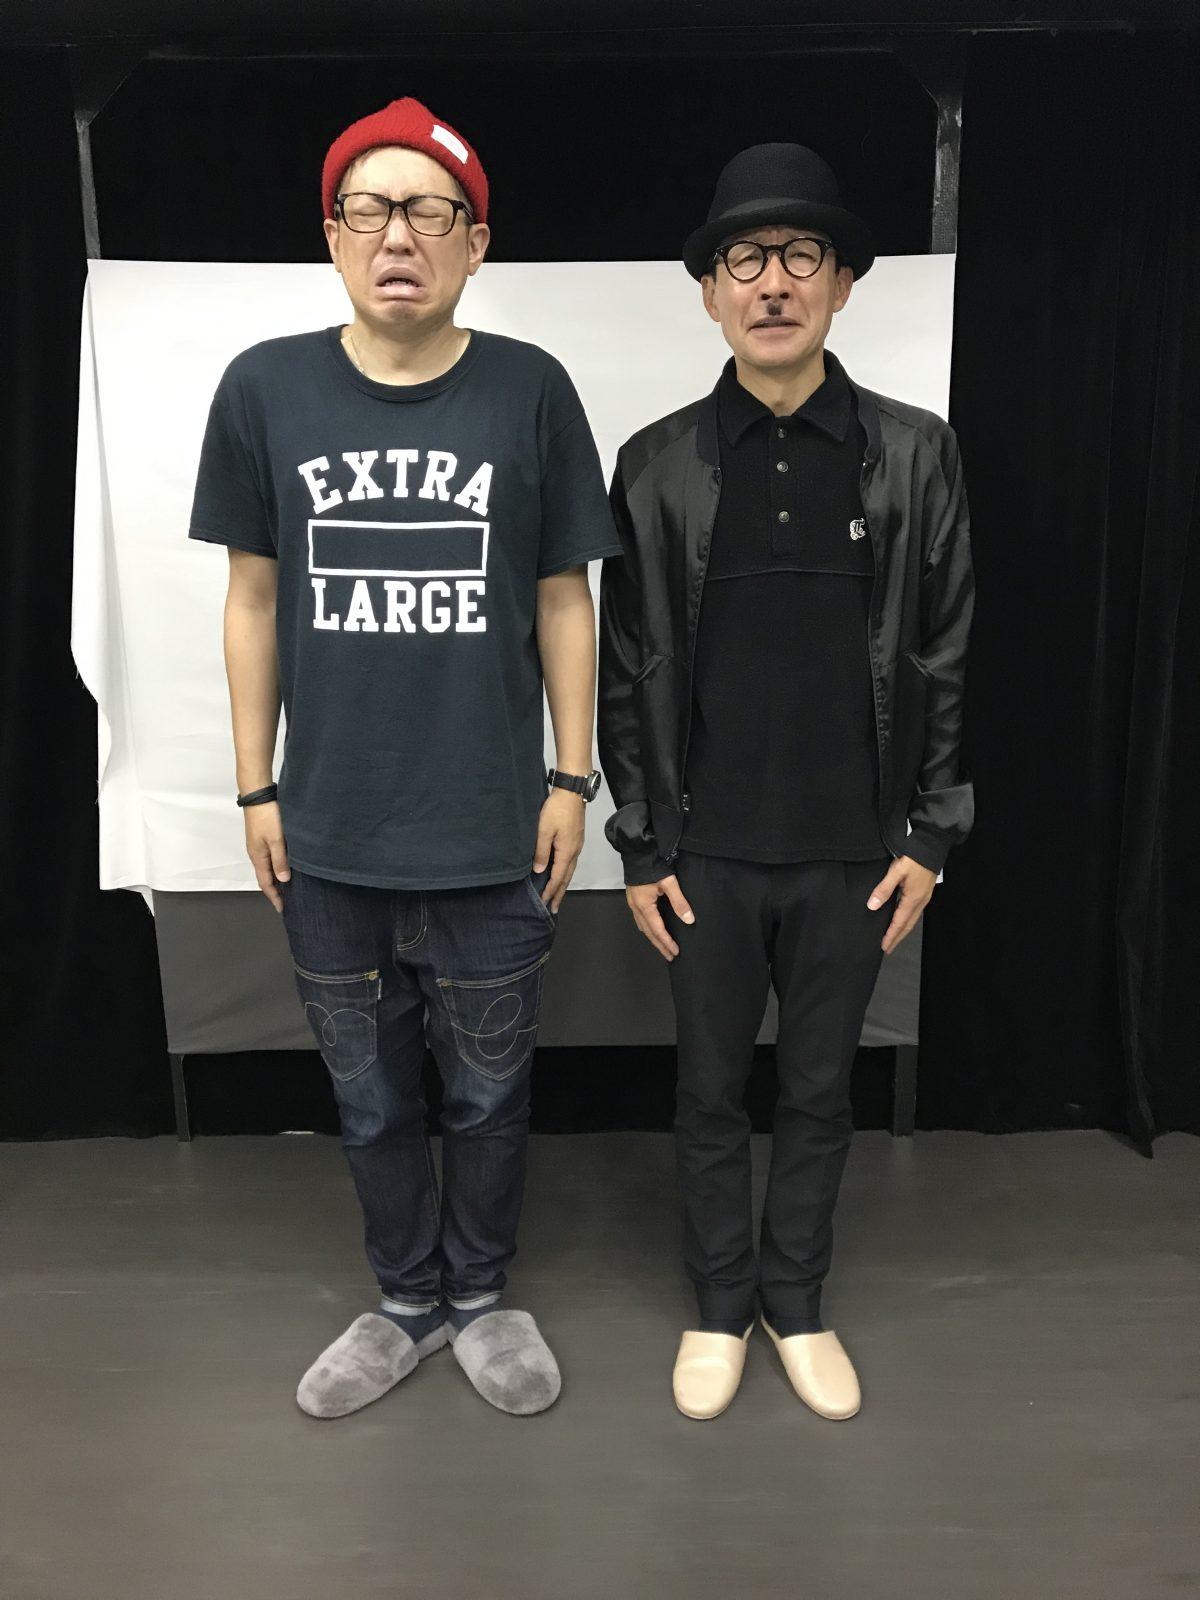 2019/09/09